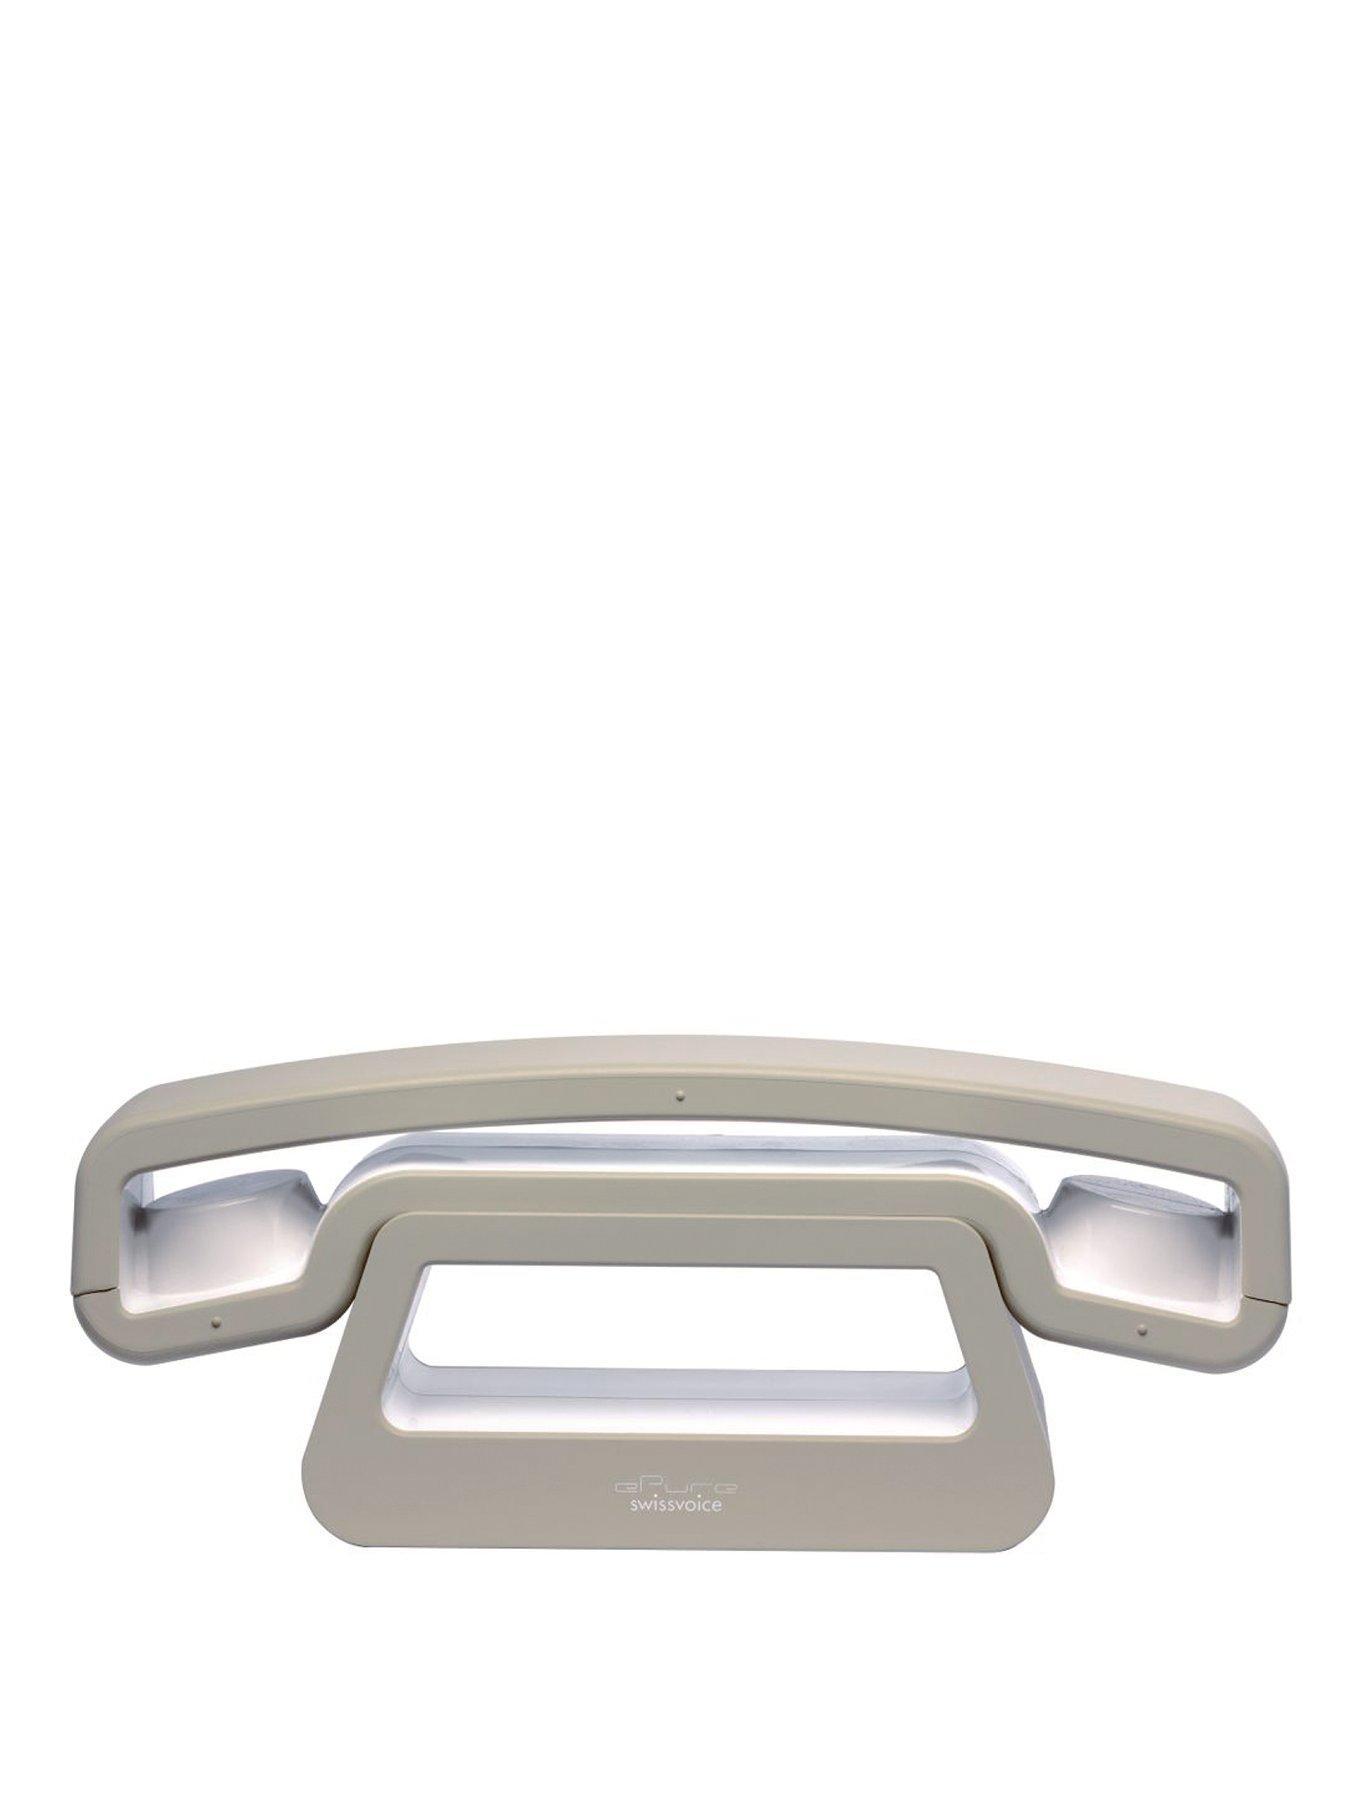 Swissvoice ePure DECT Phone - White/Beige